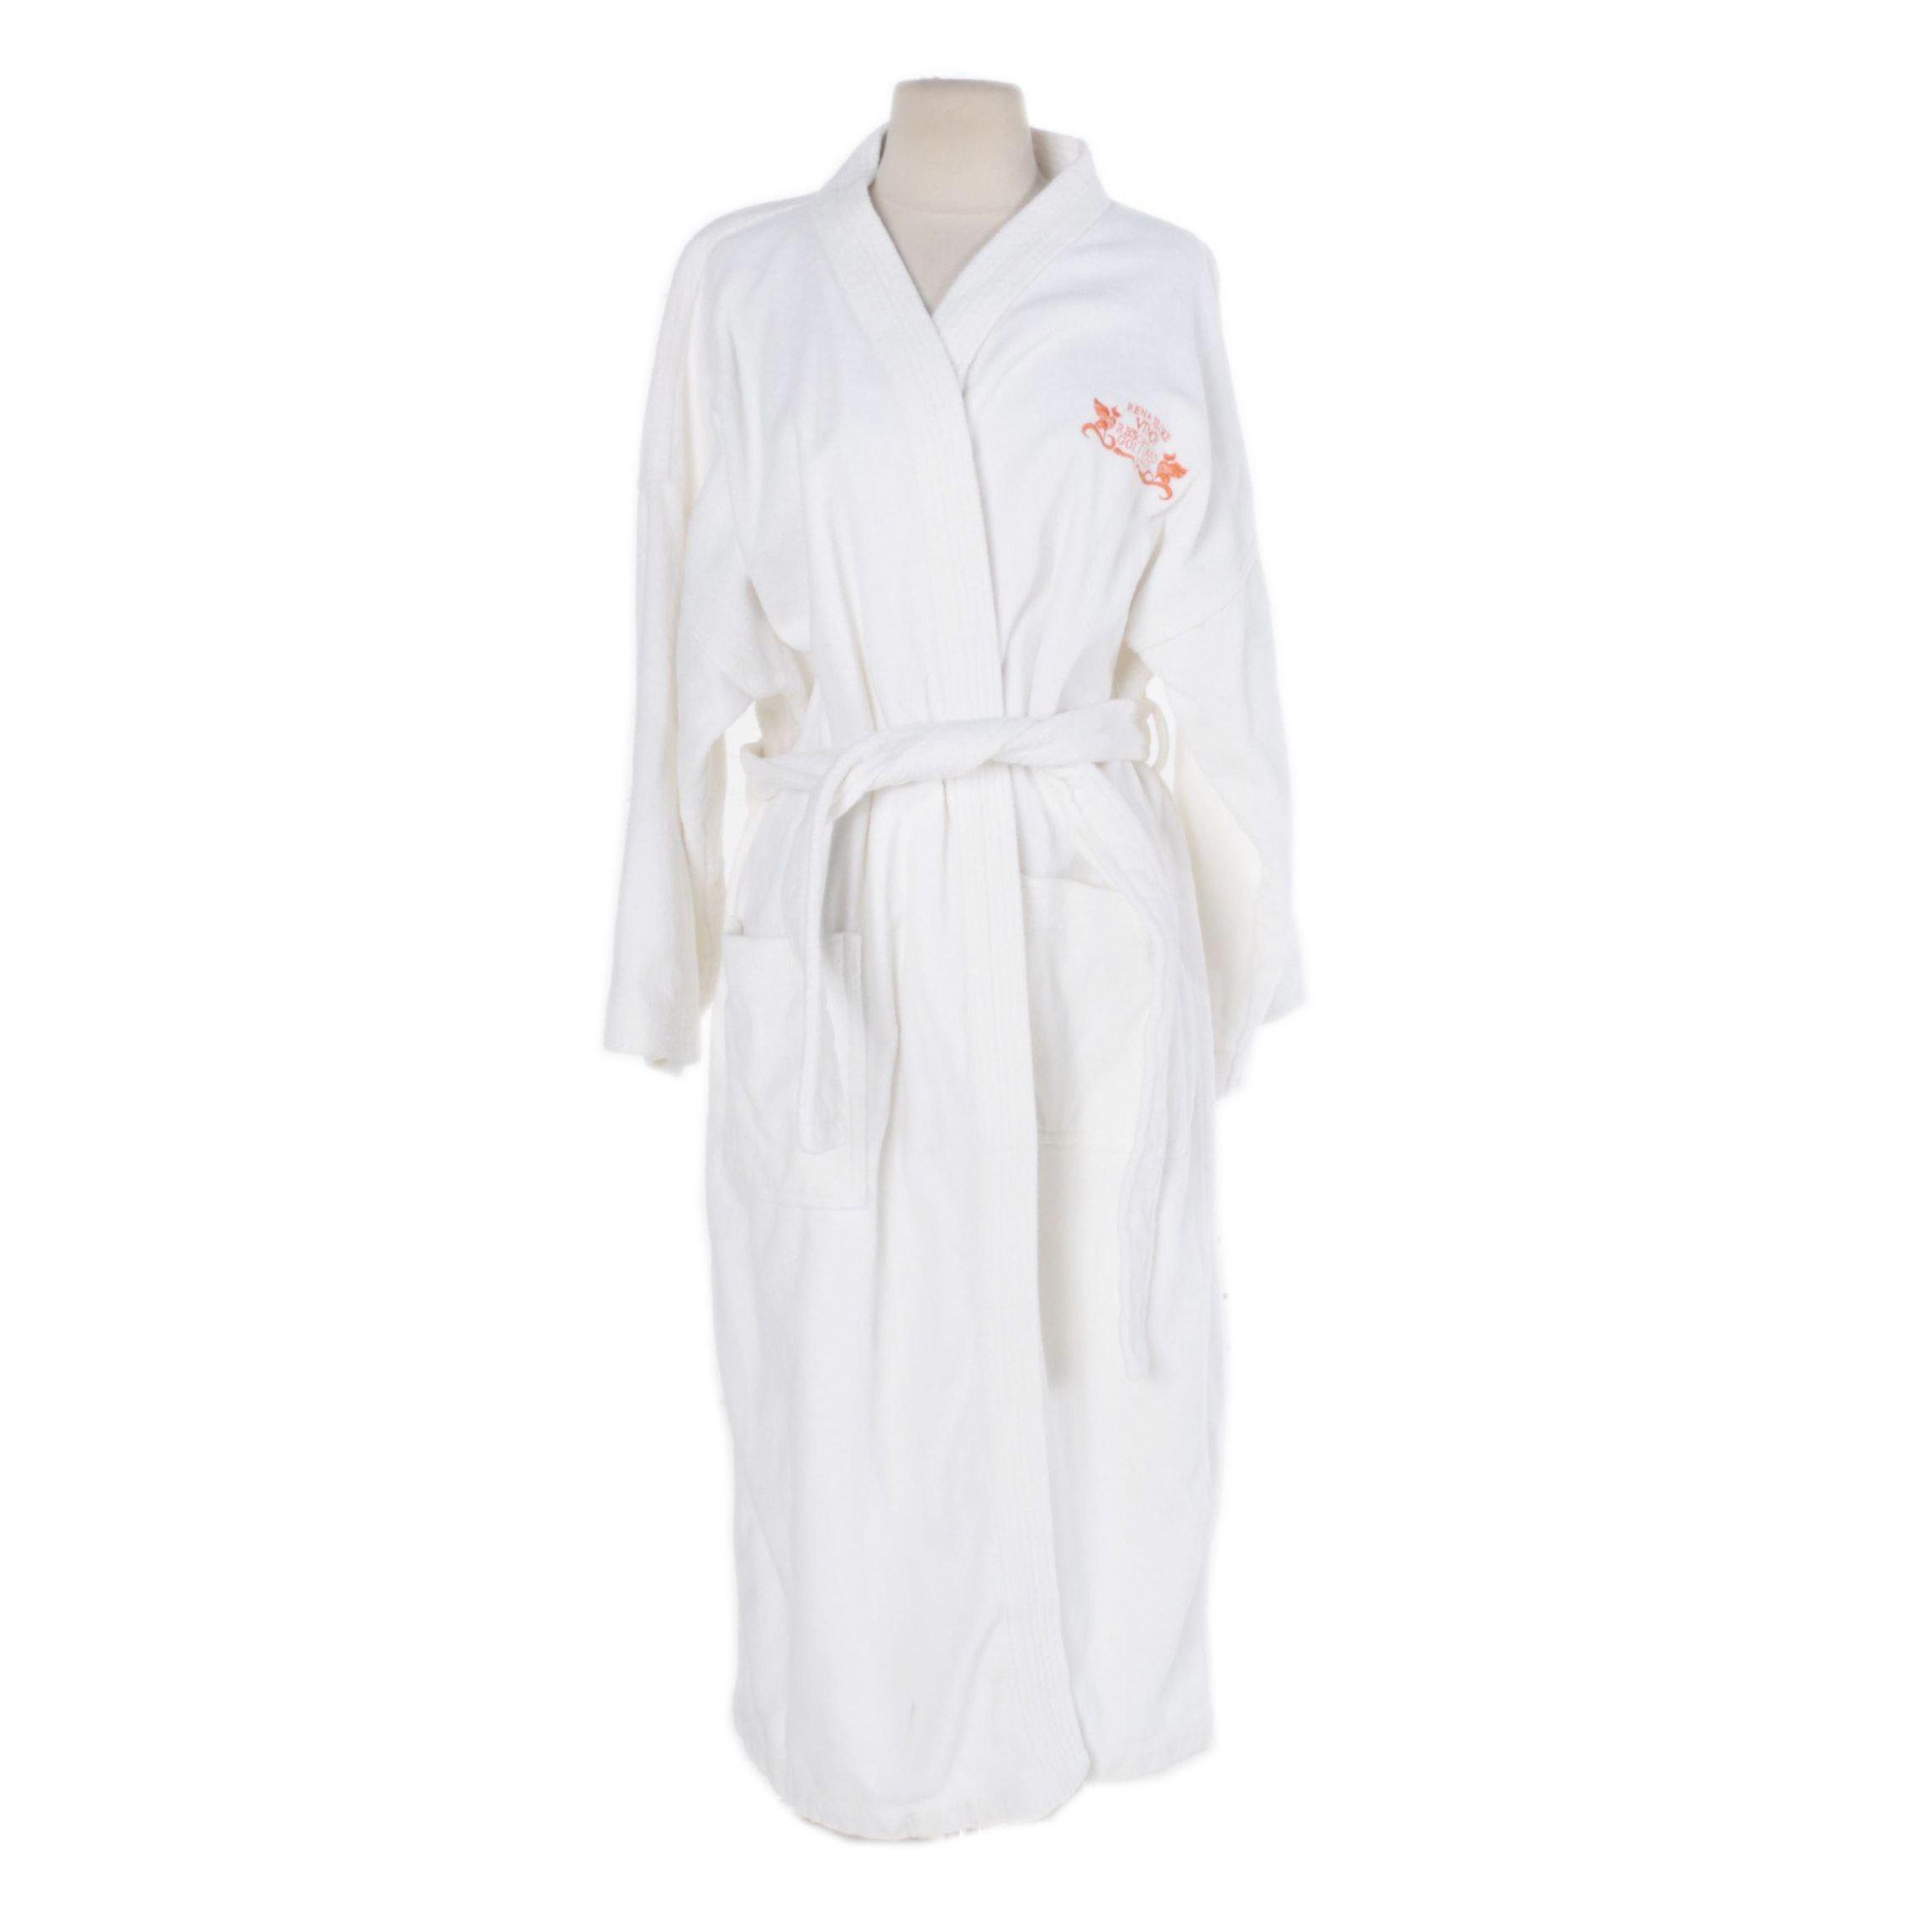 Women's Terry Cloth Spa Bathrobe